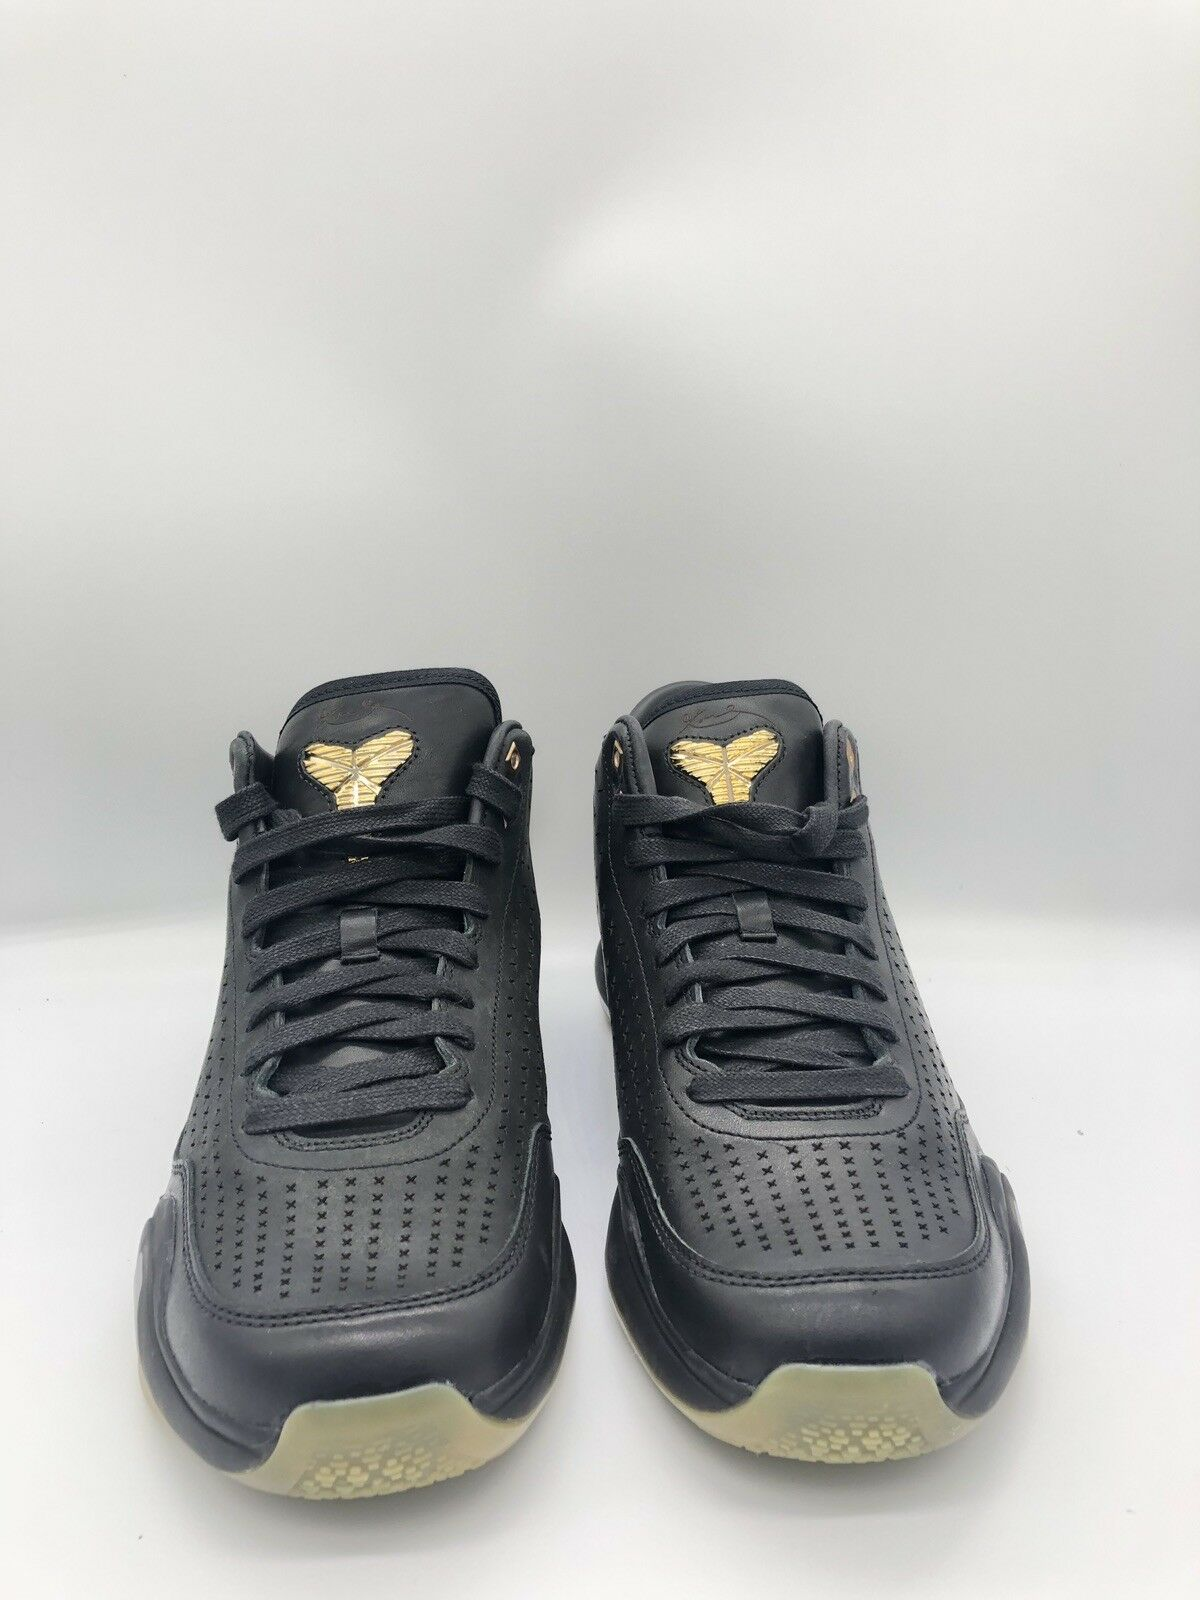 Nike Kobe X MID EXT Men's shoes Size 10.5 Black Metallic gold Gum 802366-002